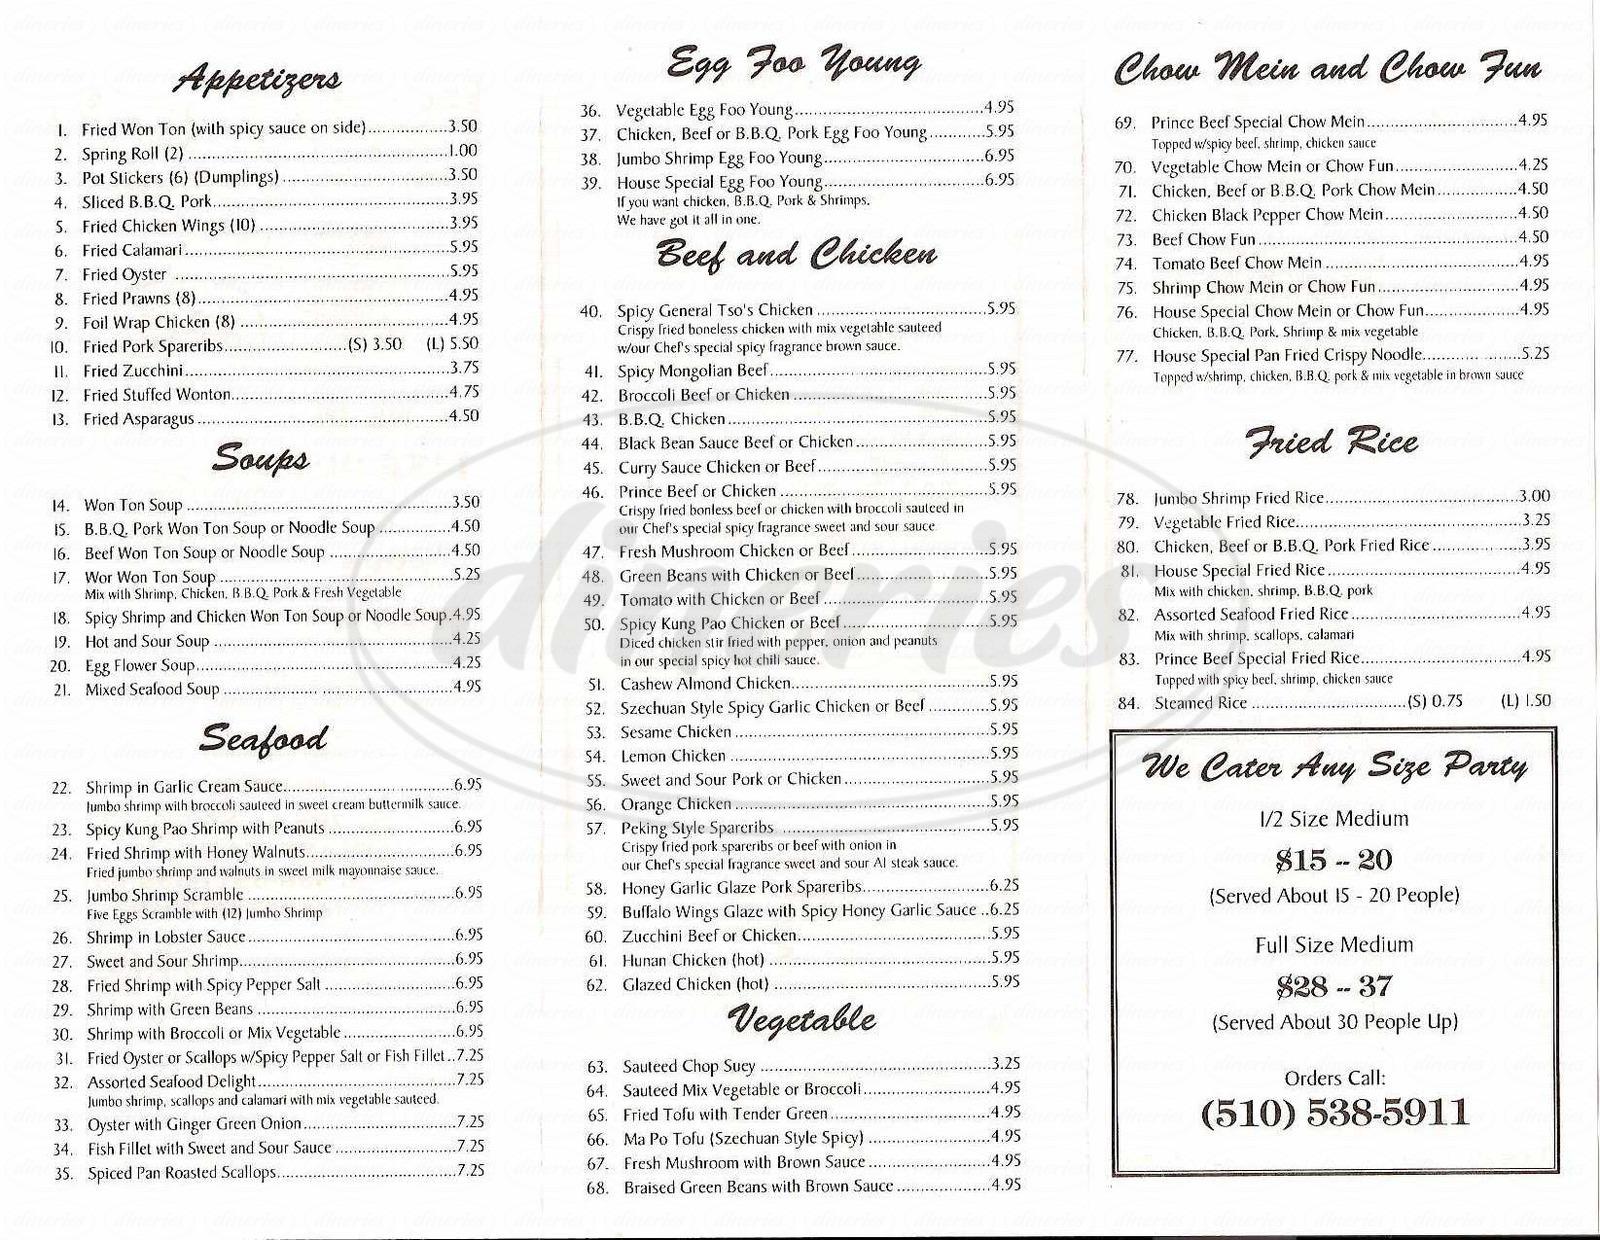 menu for Prince Beef